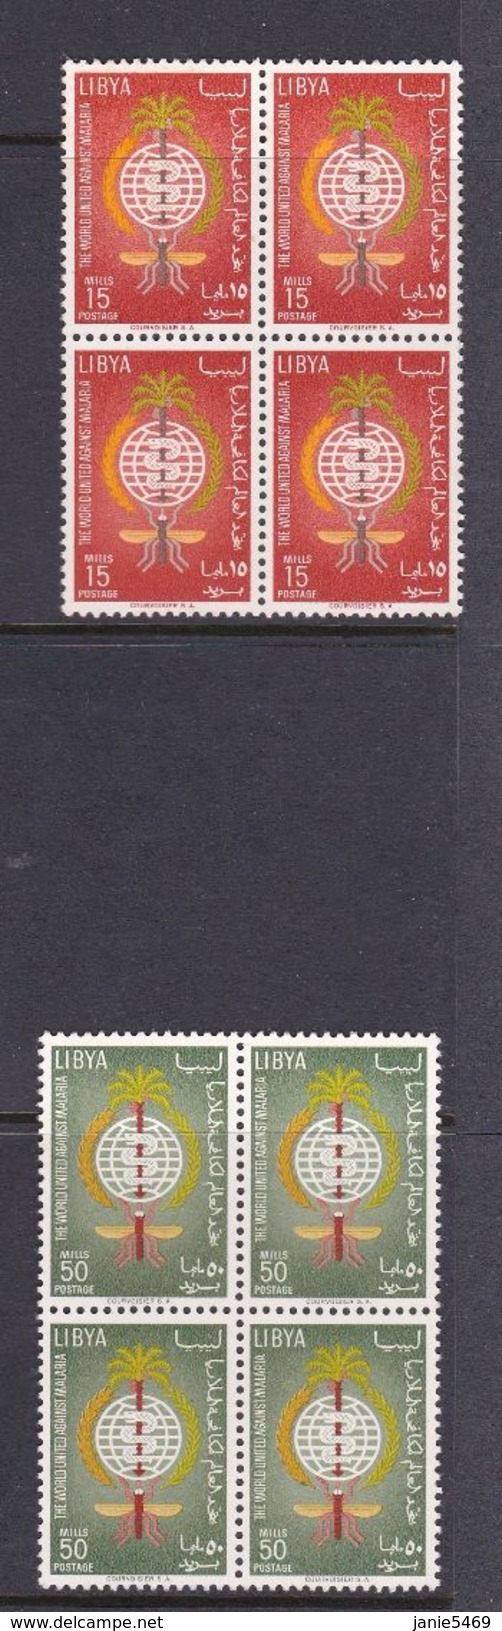 Italy-Colonies And Territories-Libya Scott 218-219 1962 Malaria Eradication, Block 4, Mint Never Hinged - Libya